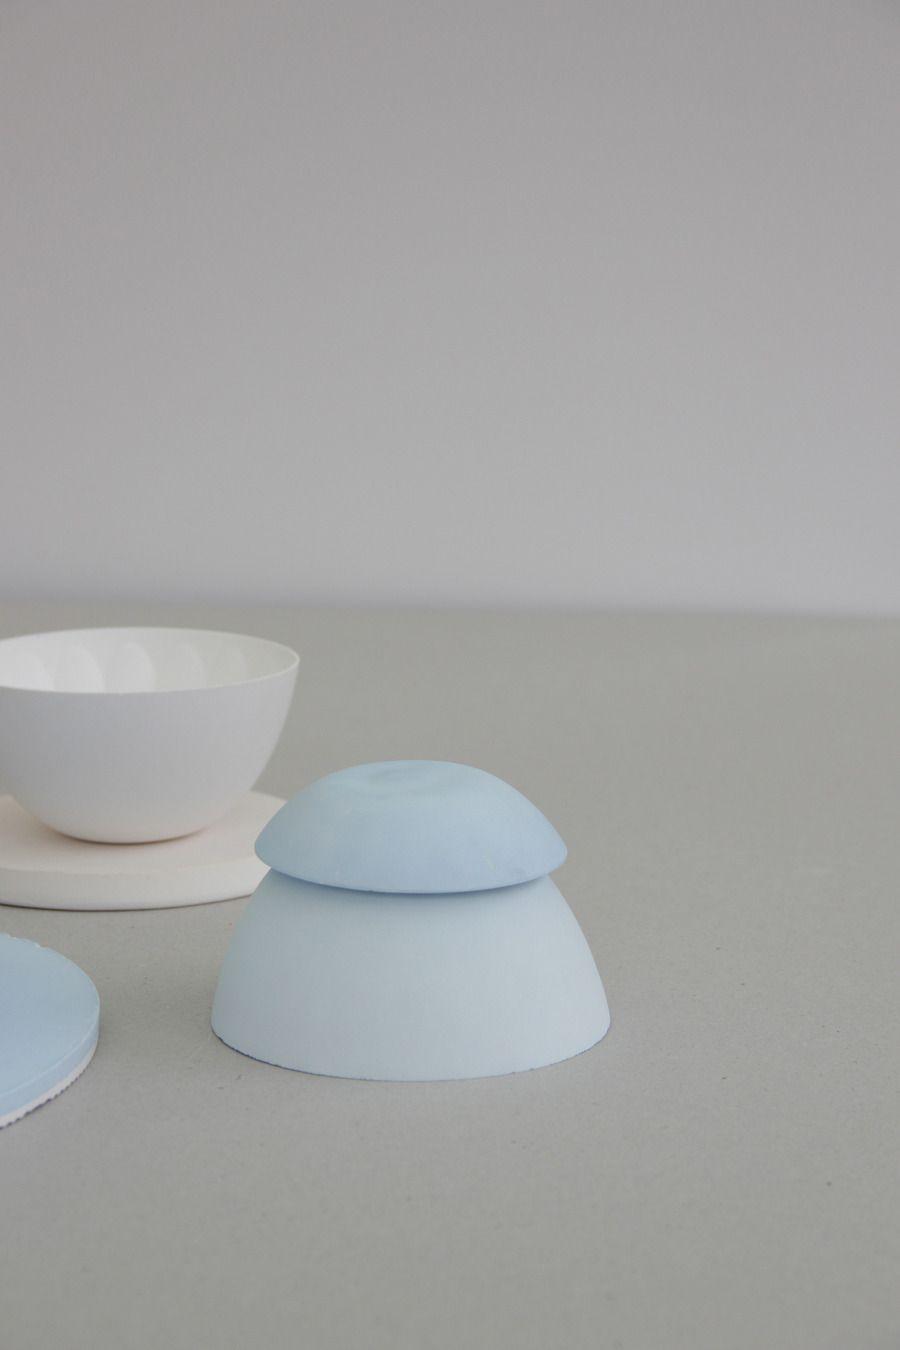 Lina Marie Koeppen Porcelana Colores Tierra